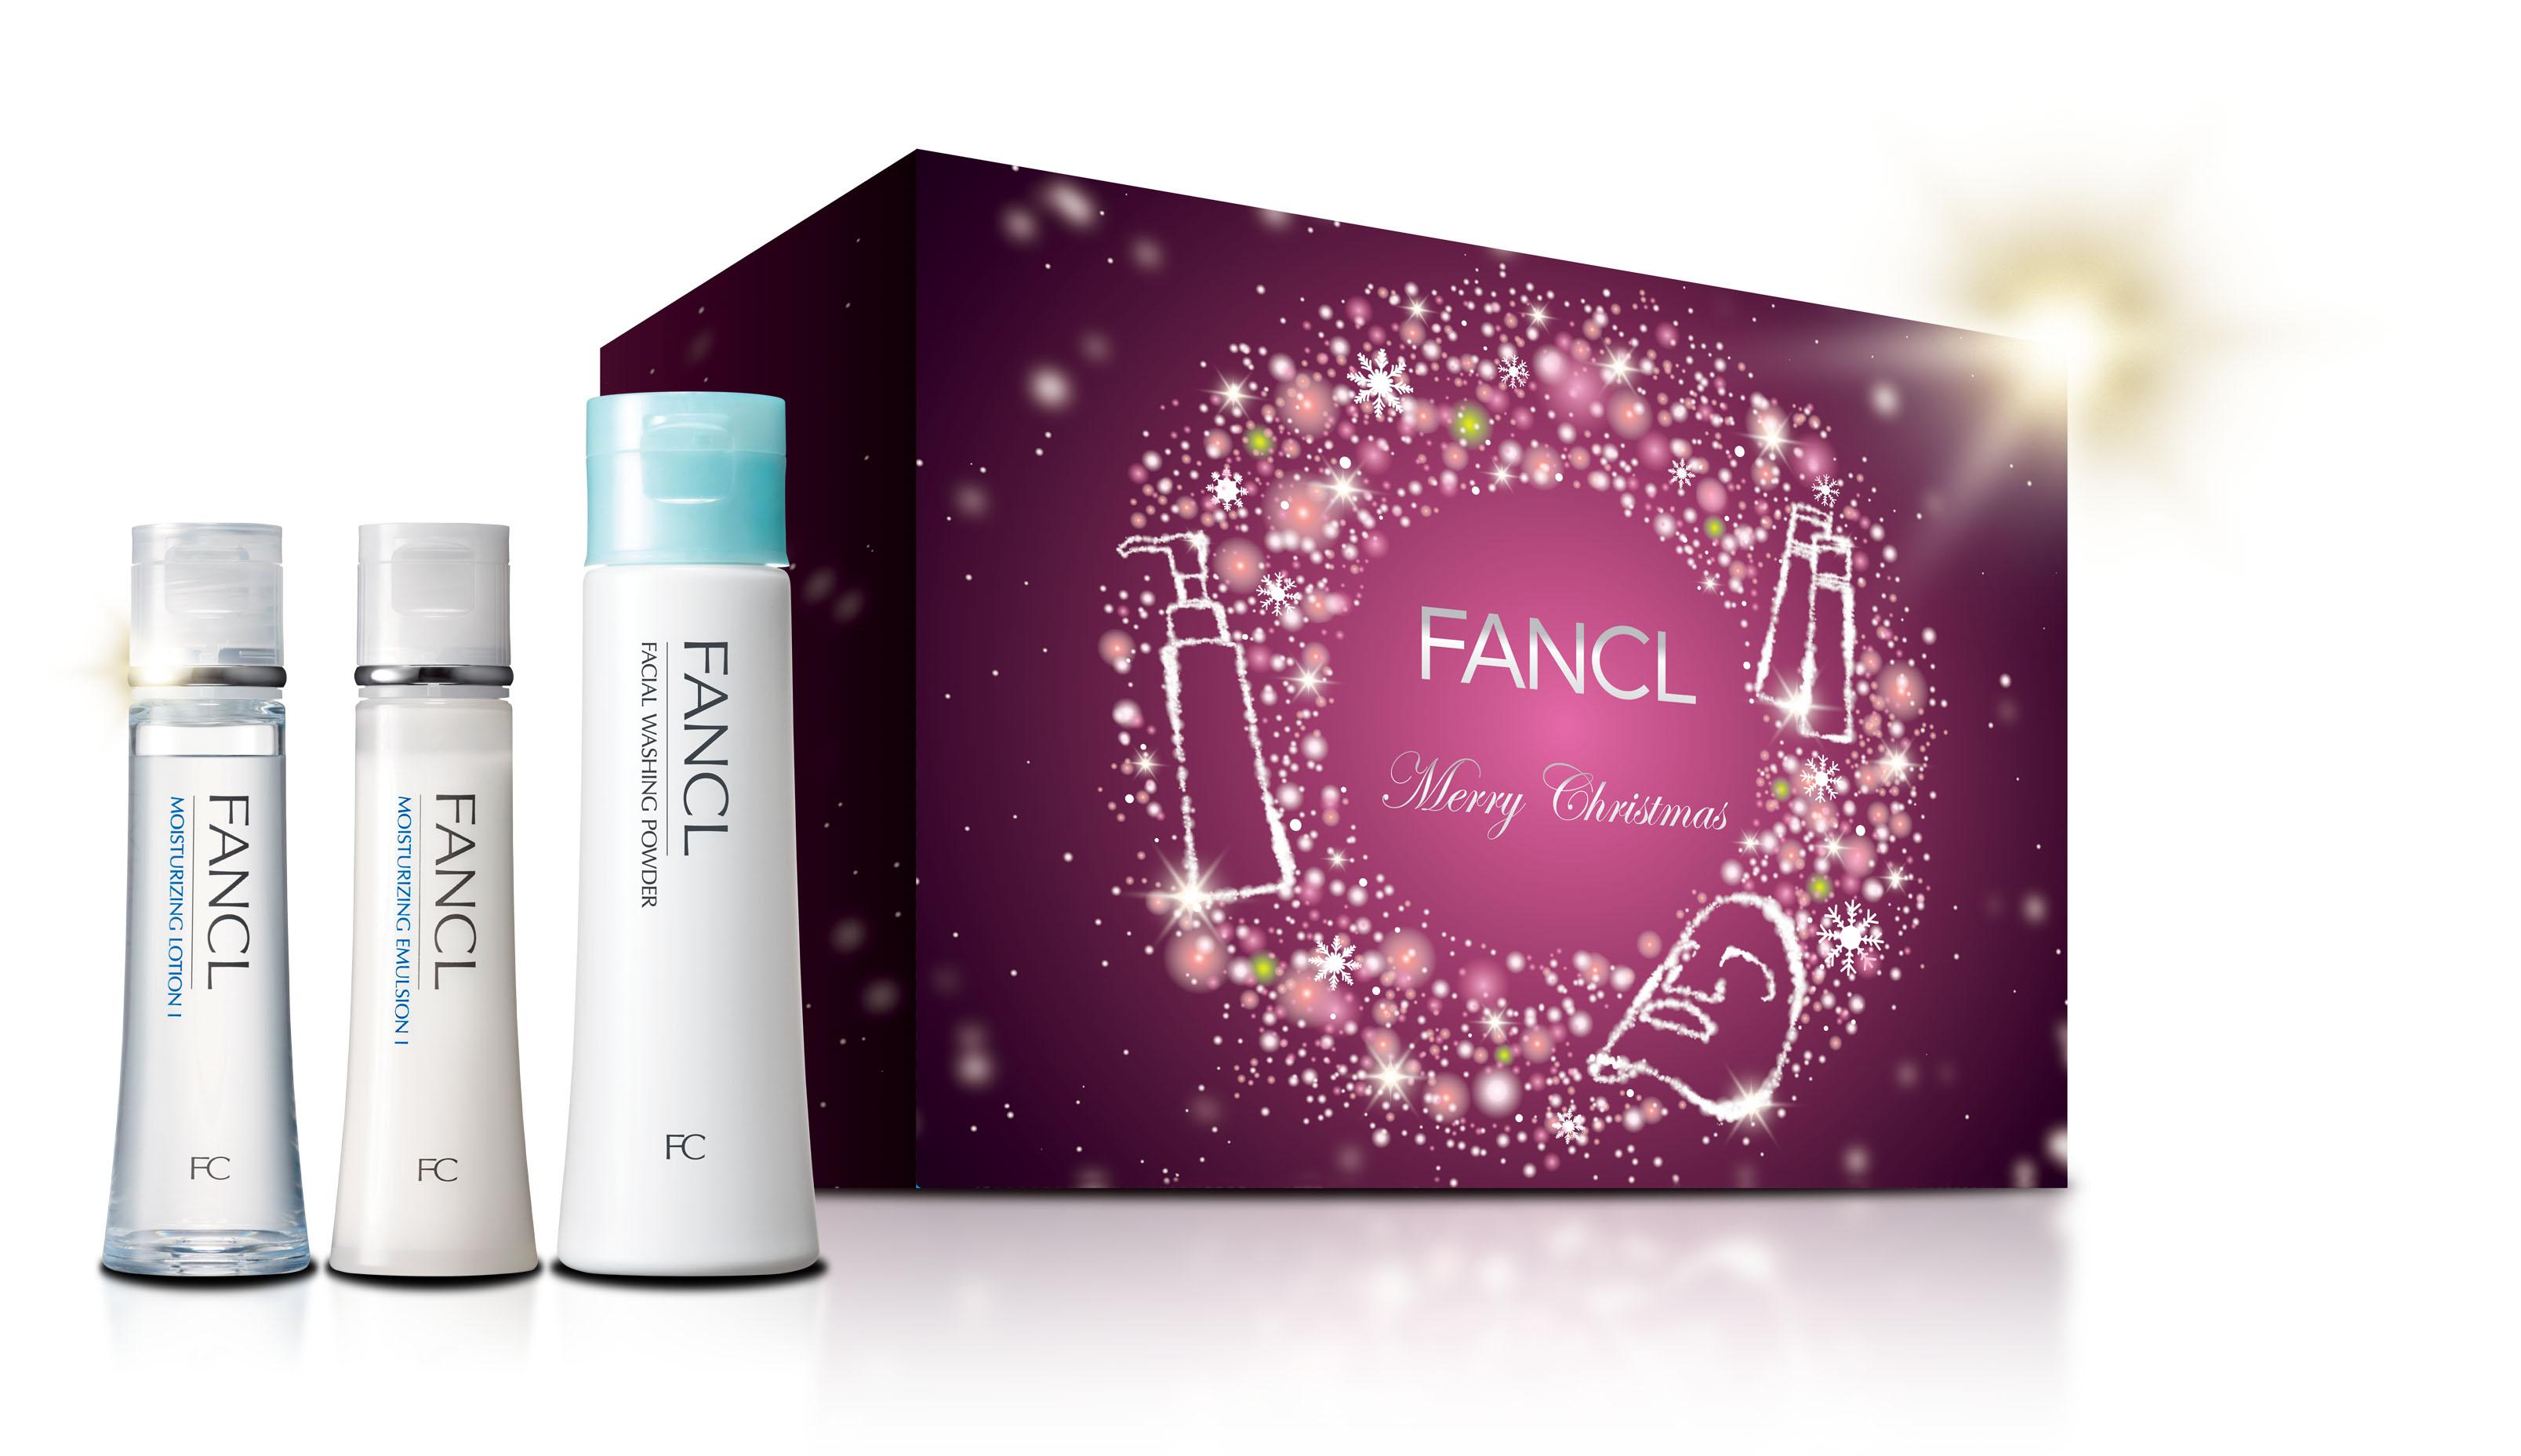 Fancl Holiday Set